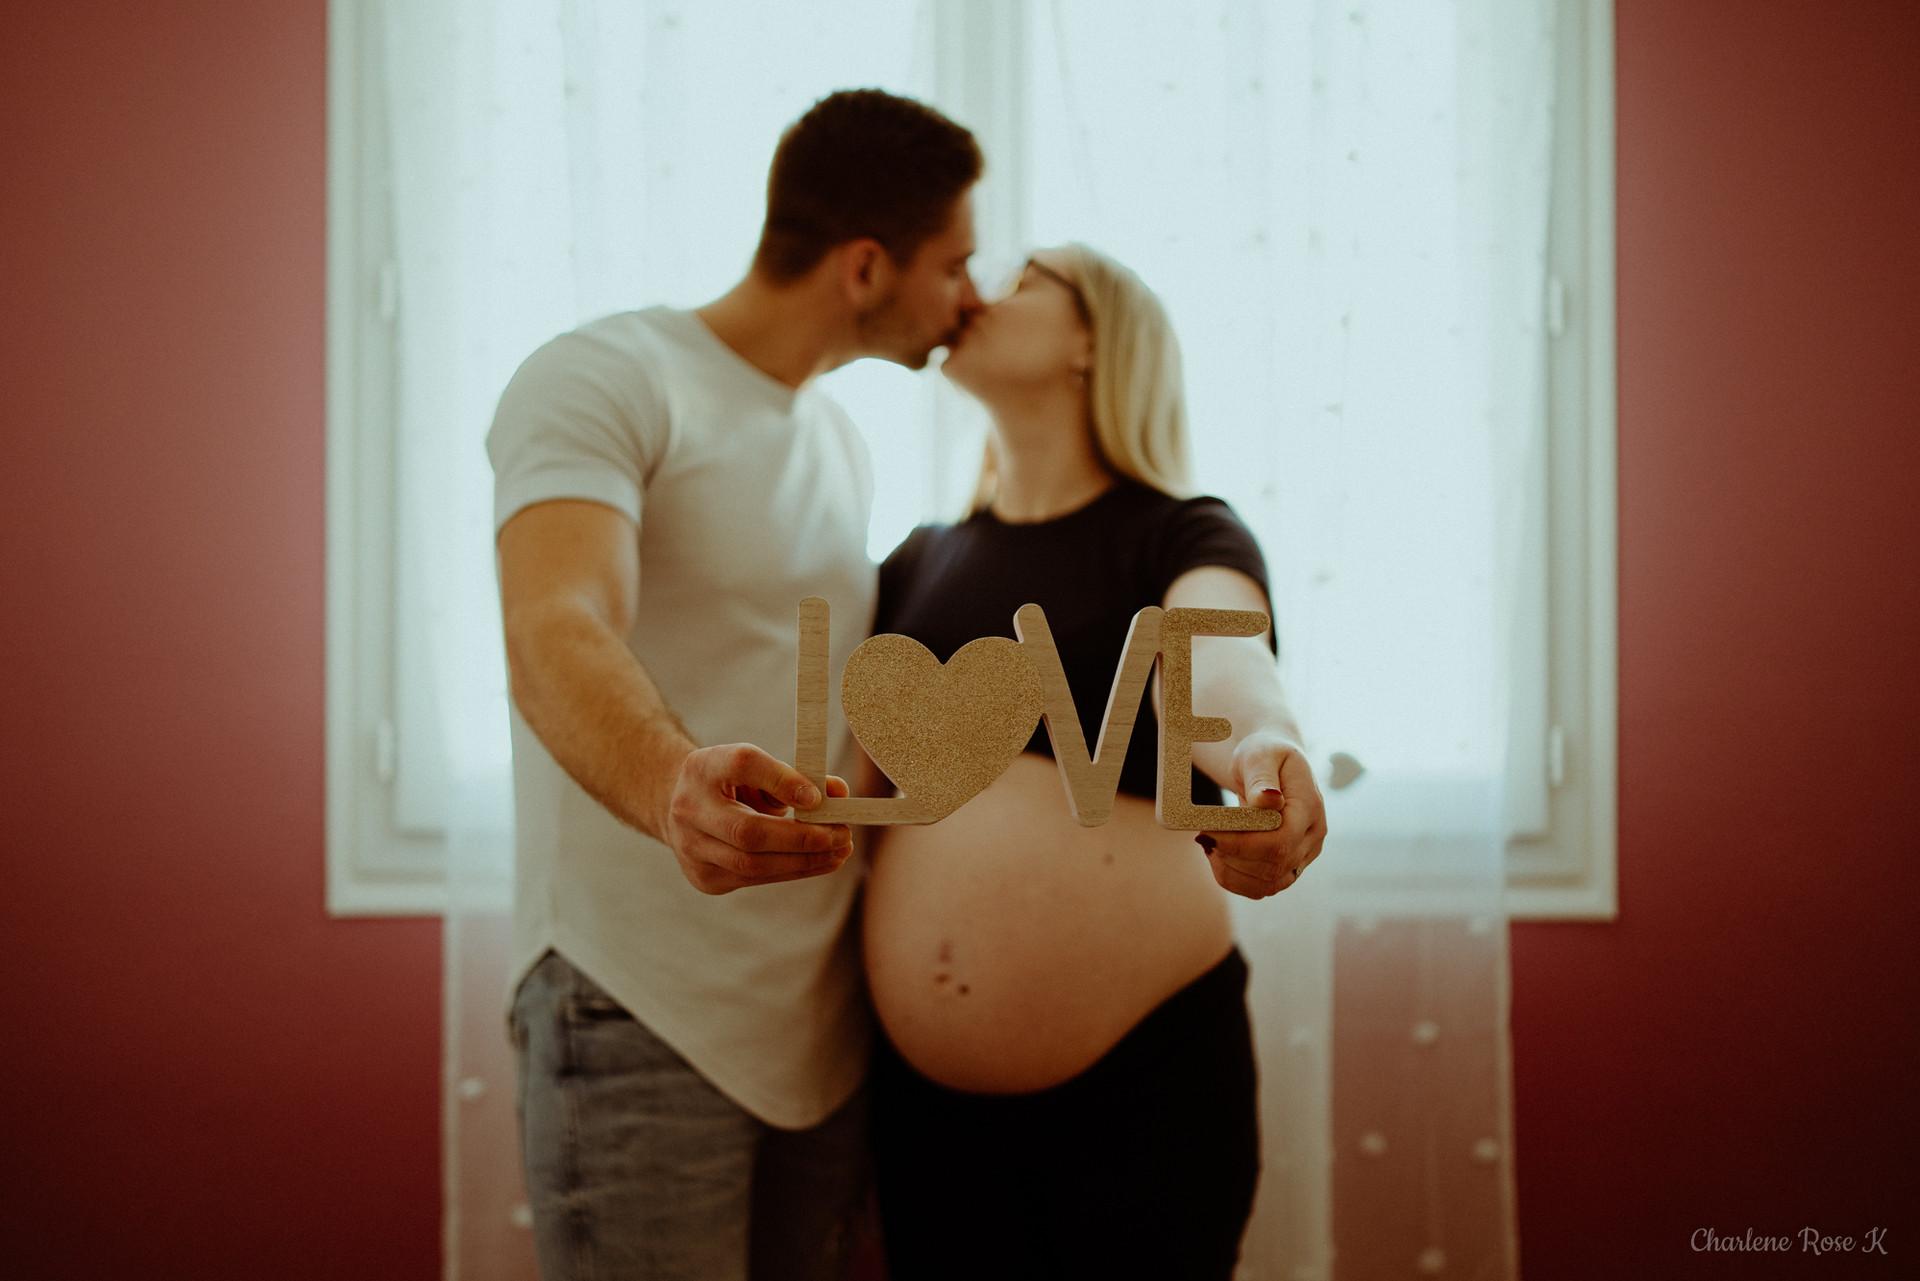 photographe-troyes-grossesse-maternité-lifestyle-domicile-crk-2